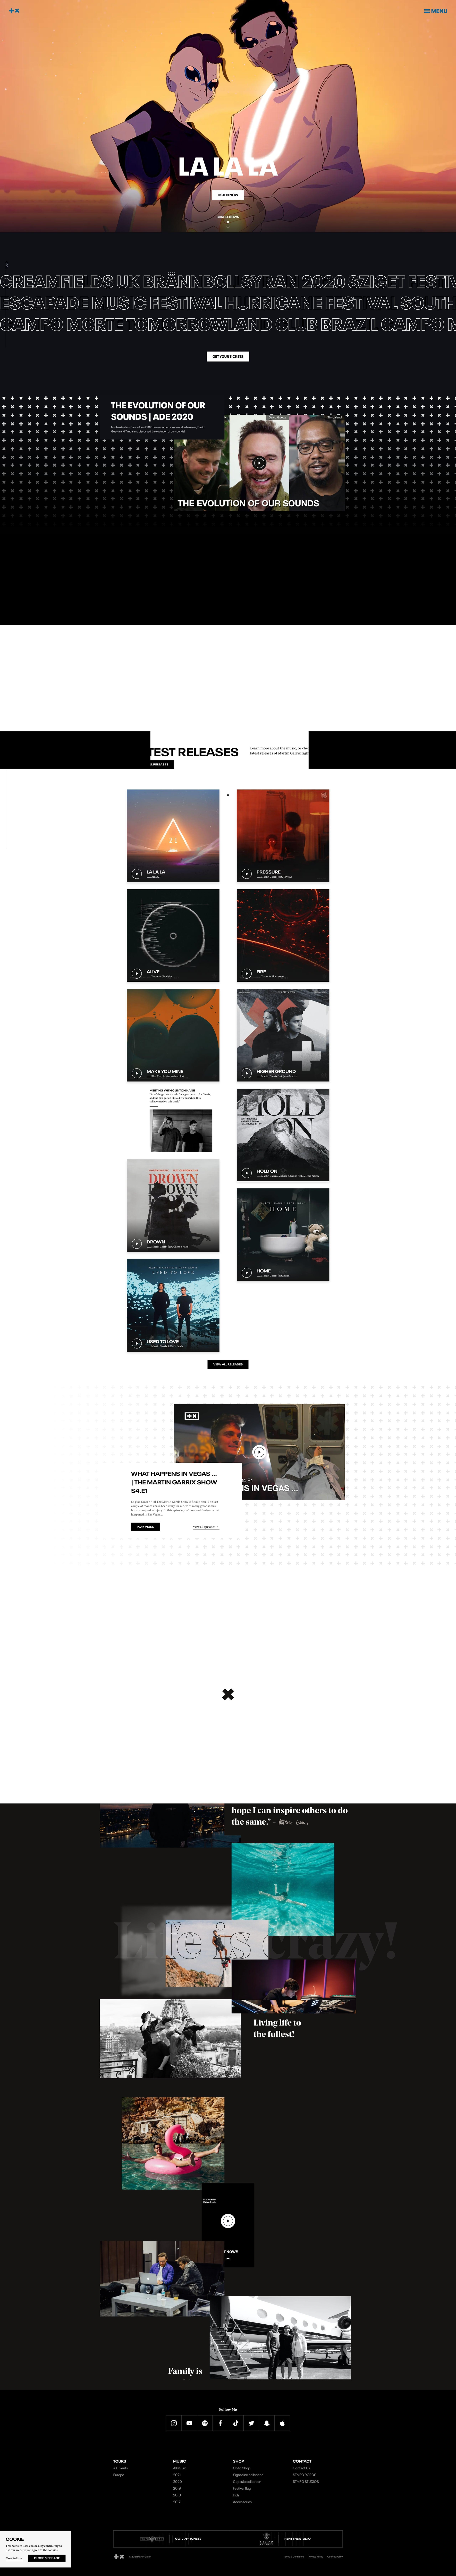 Martin Garrix website homepage